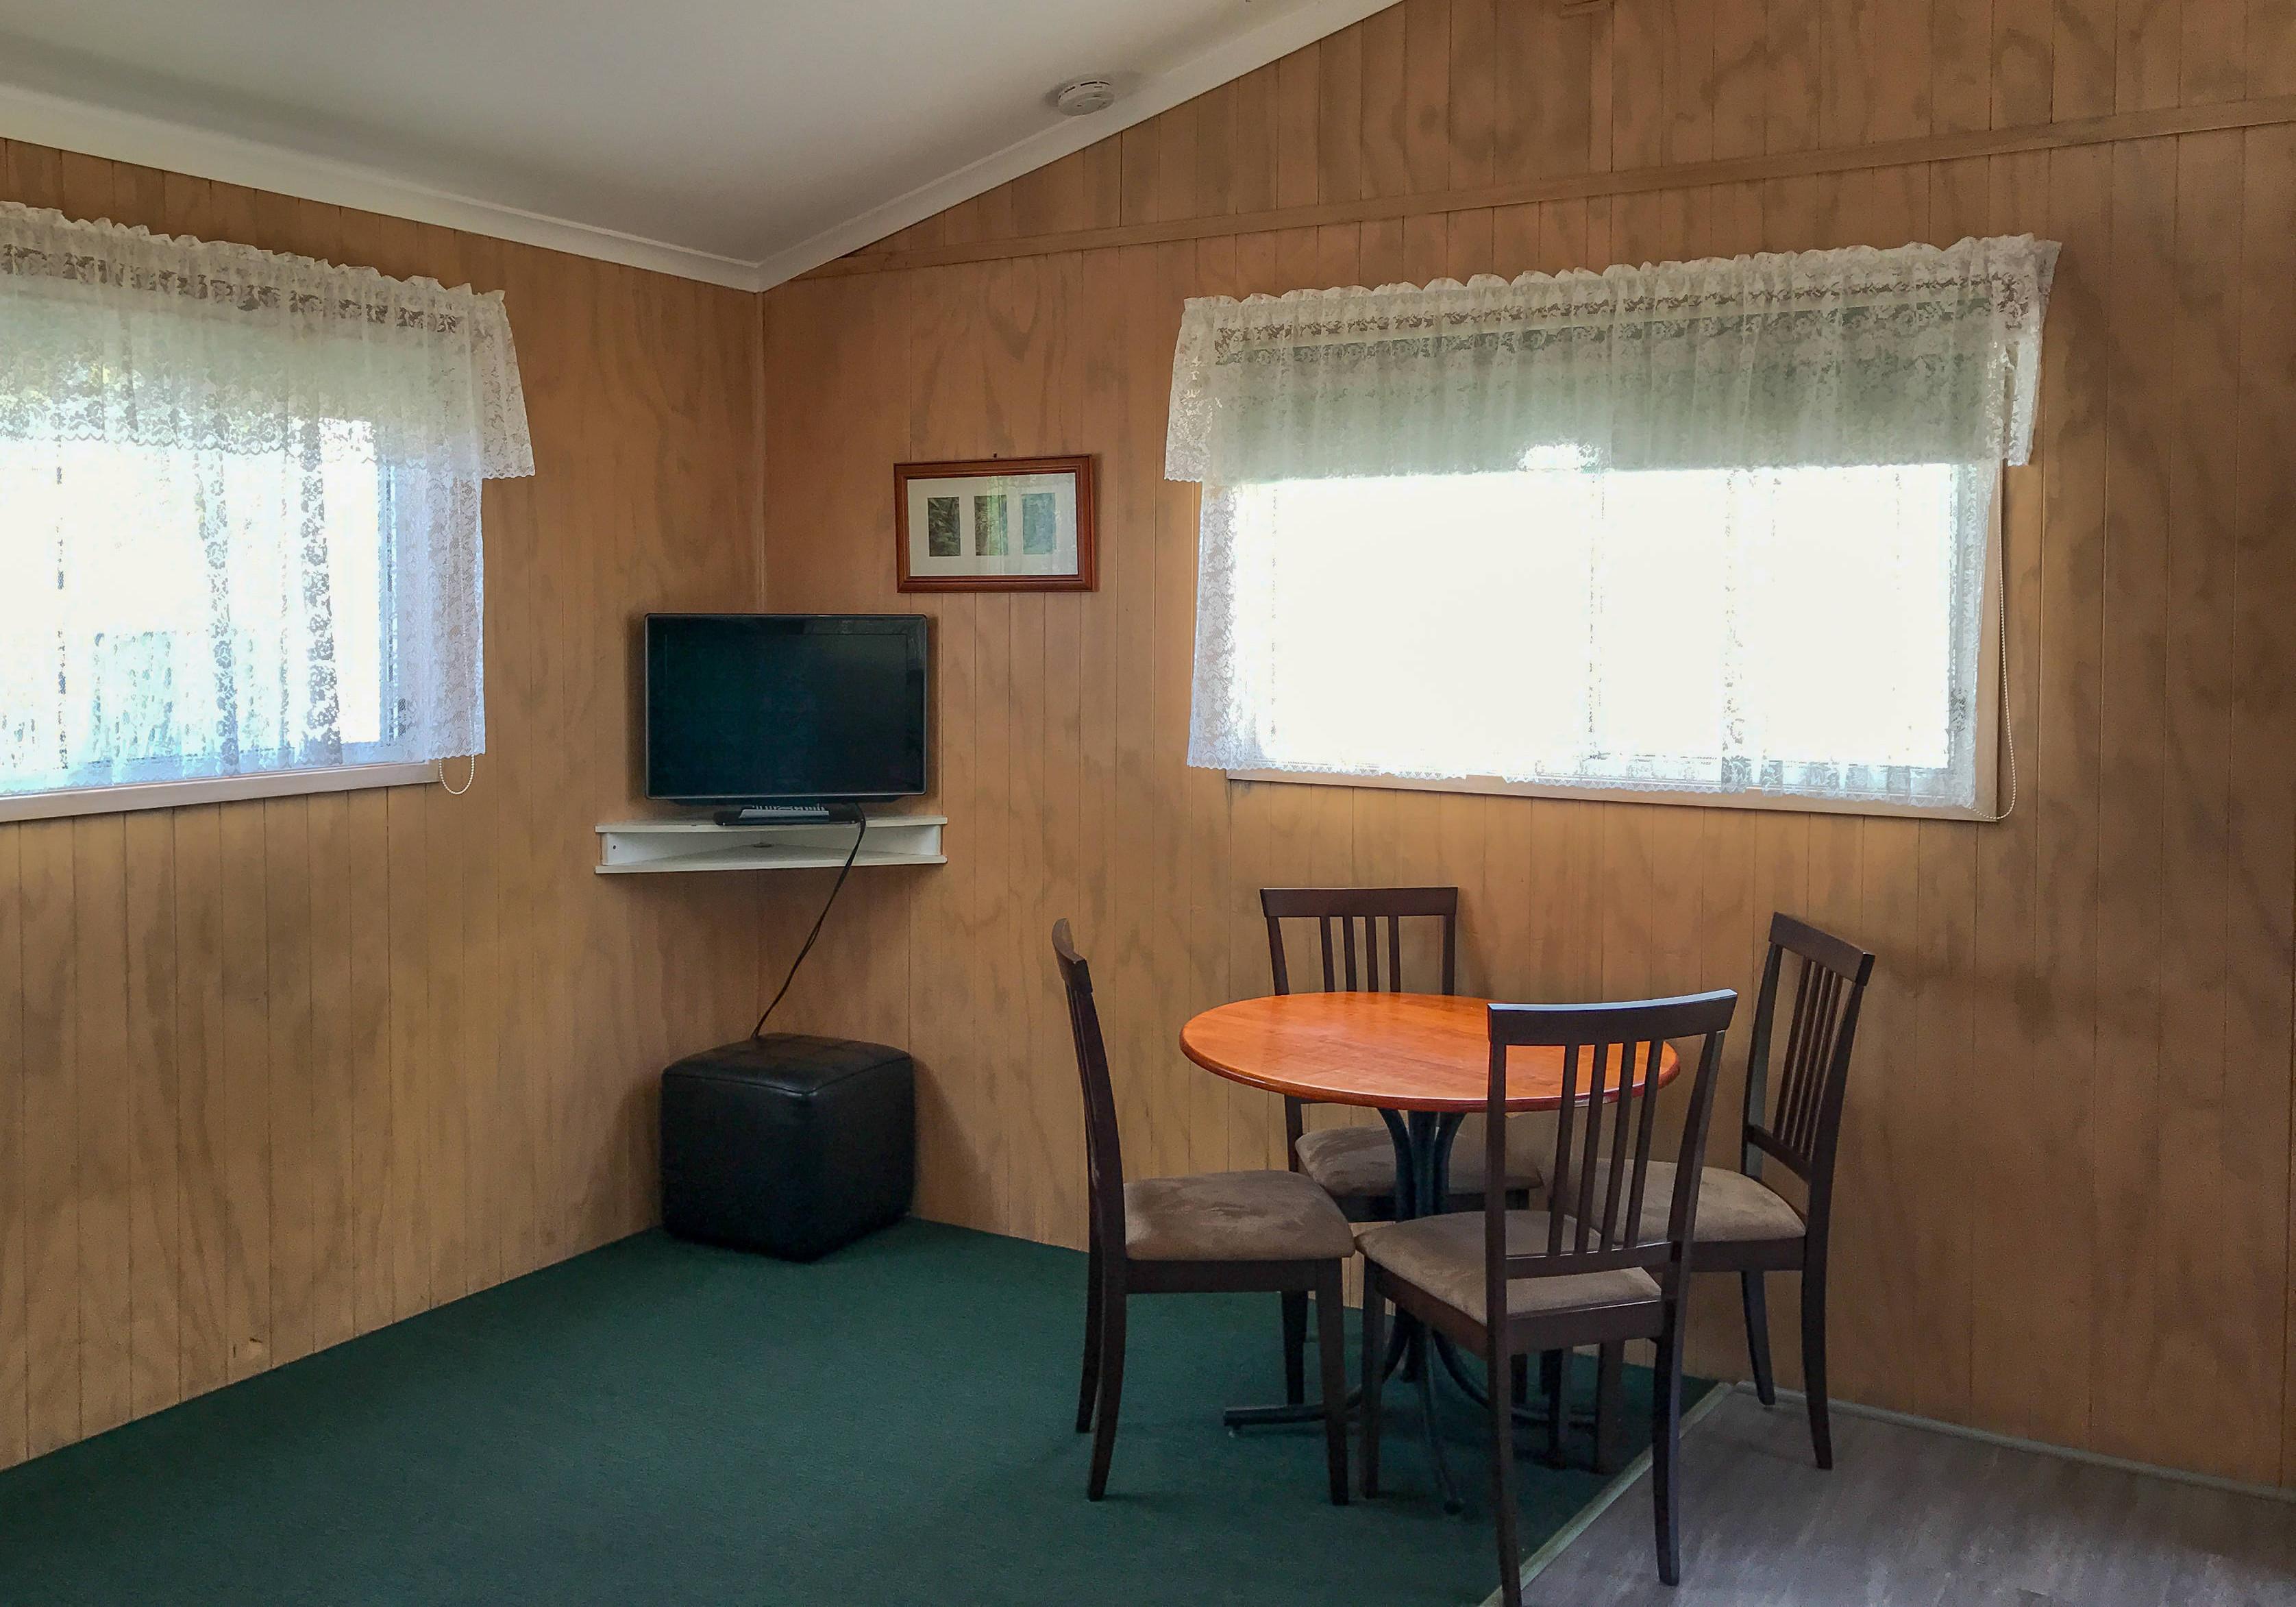 Cabin 56 - Sitting area